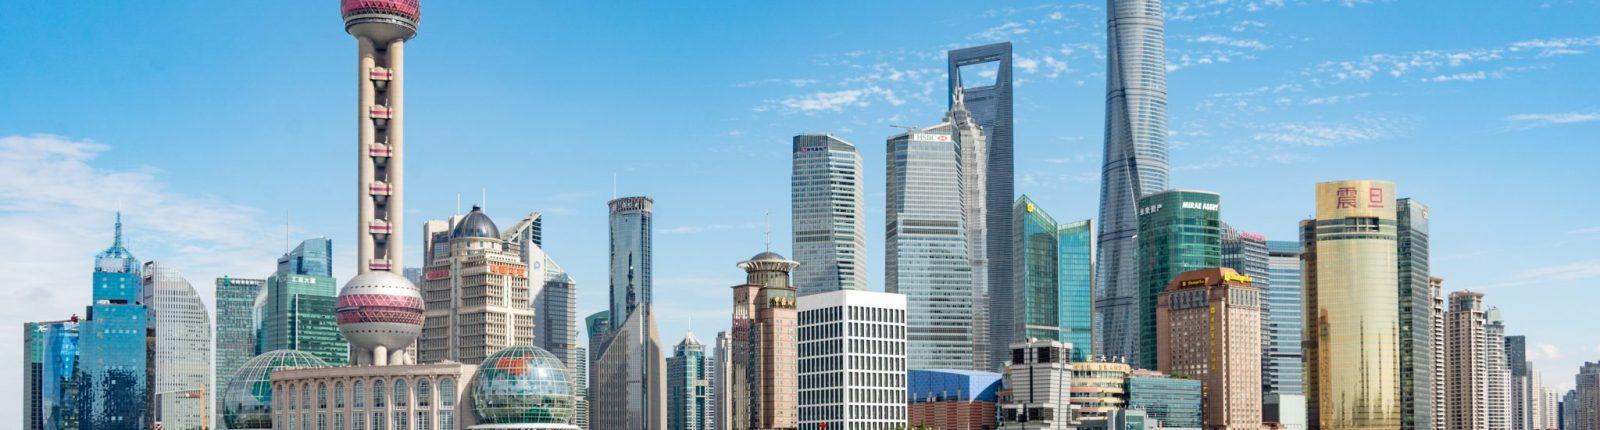 Shanghai (Novembre 2017)